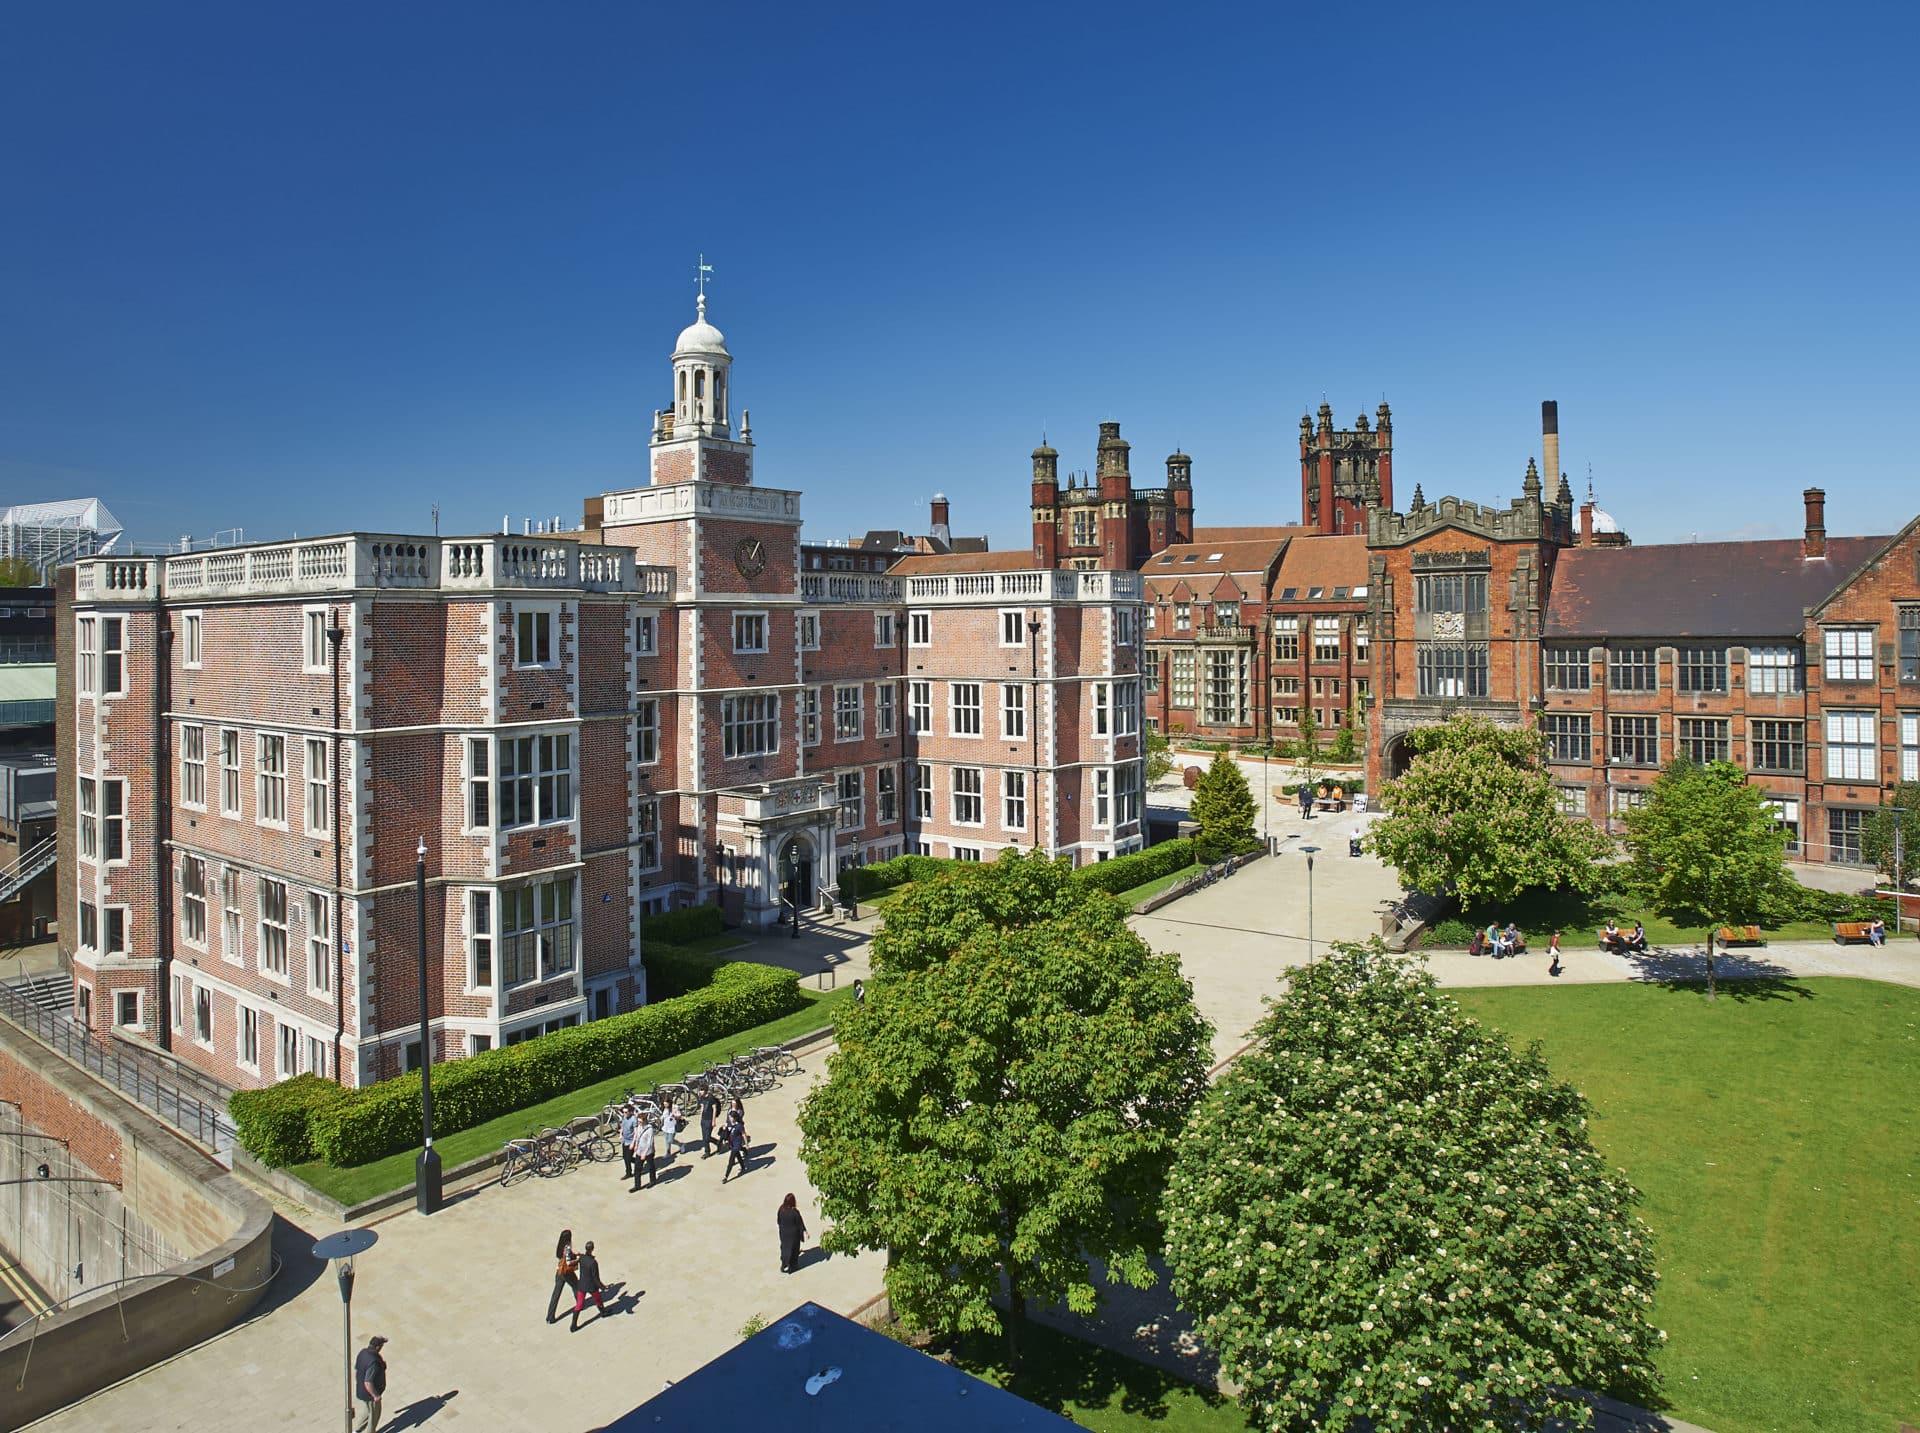 Newcastle University Students Union Bldg